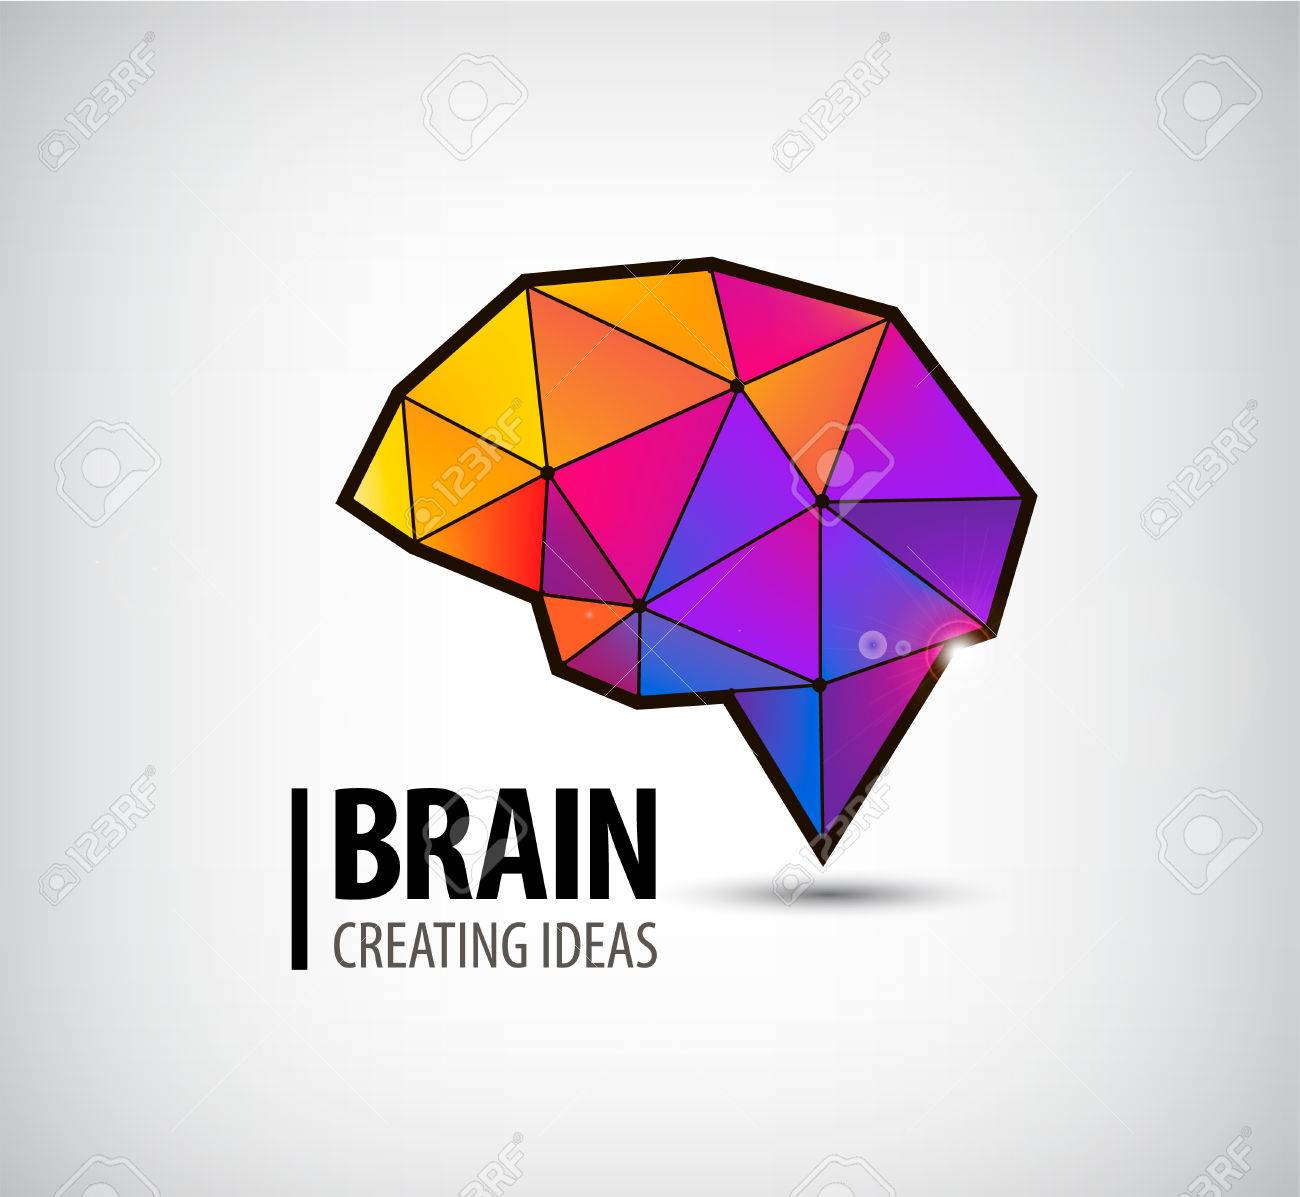 vector crystal brain logo, icon, illustration. Colorful 3d geometric sign - 43196883